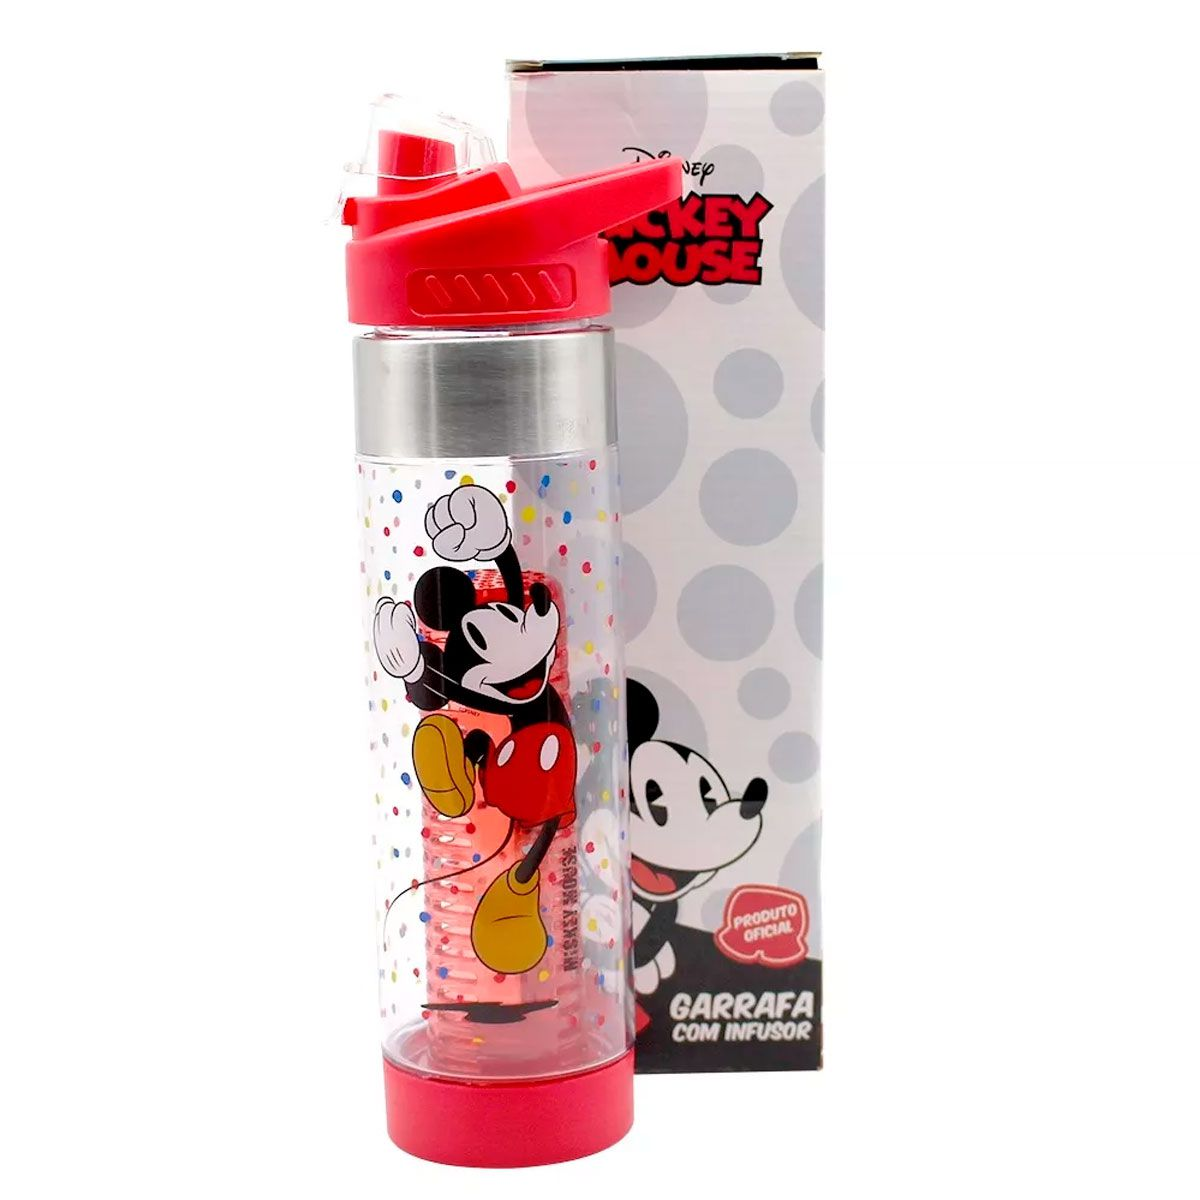 Garrafa Com Infusor Mickey Mouse 750ML